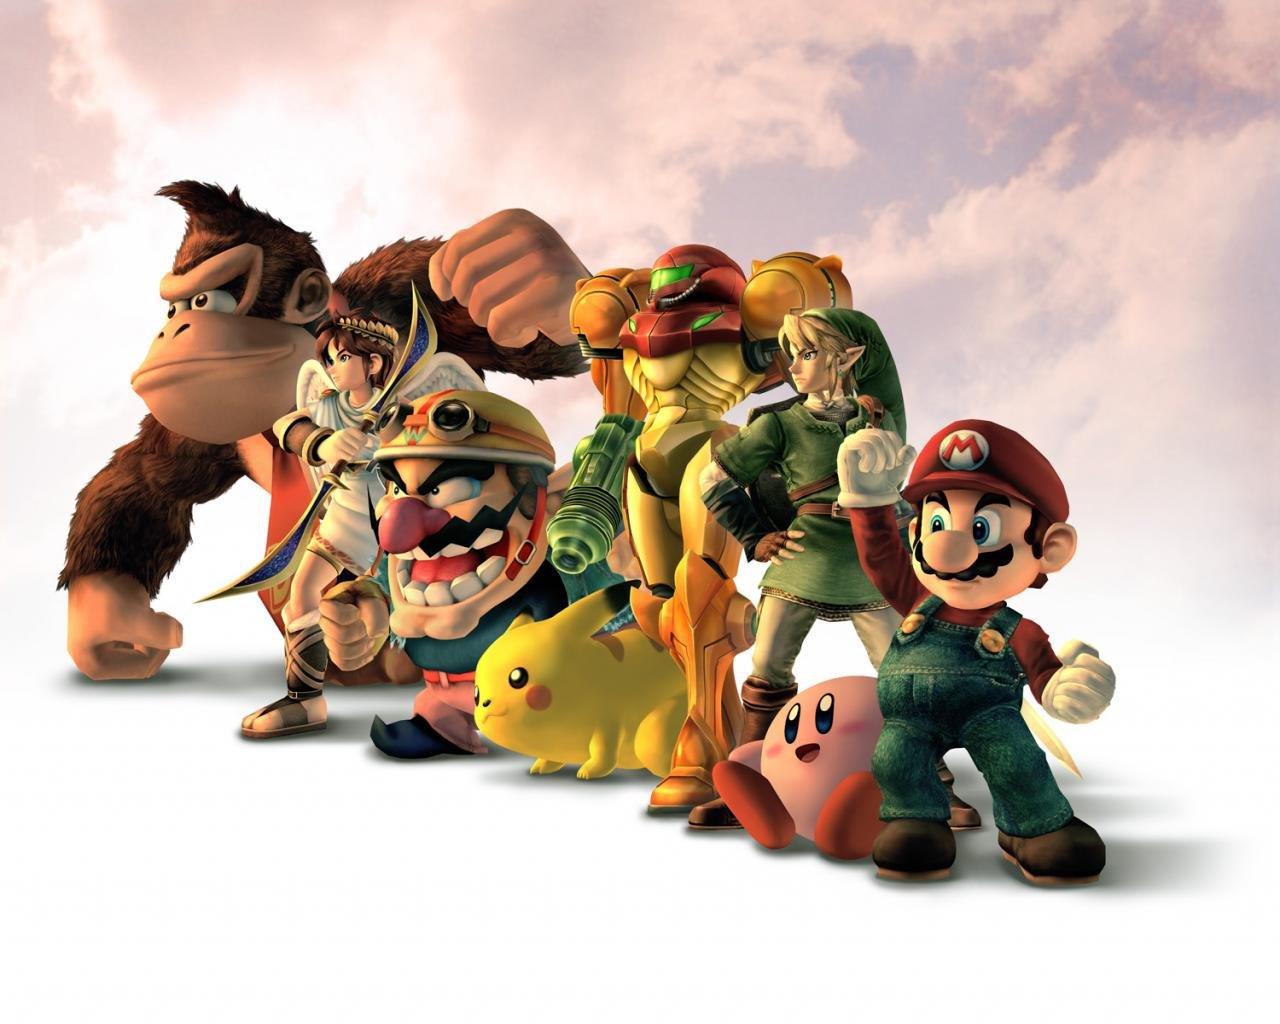 Super Smash Bros Wallpapers 1280x1024 Desktop Backgrounds